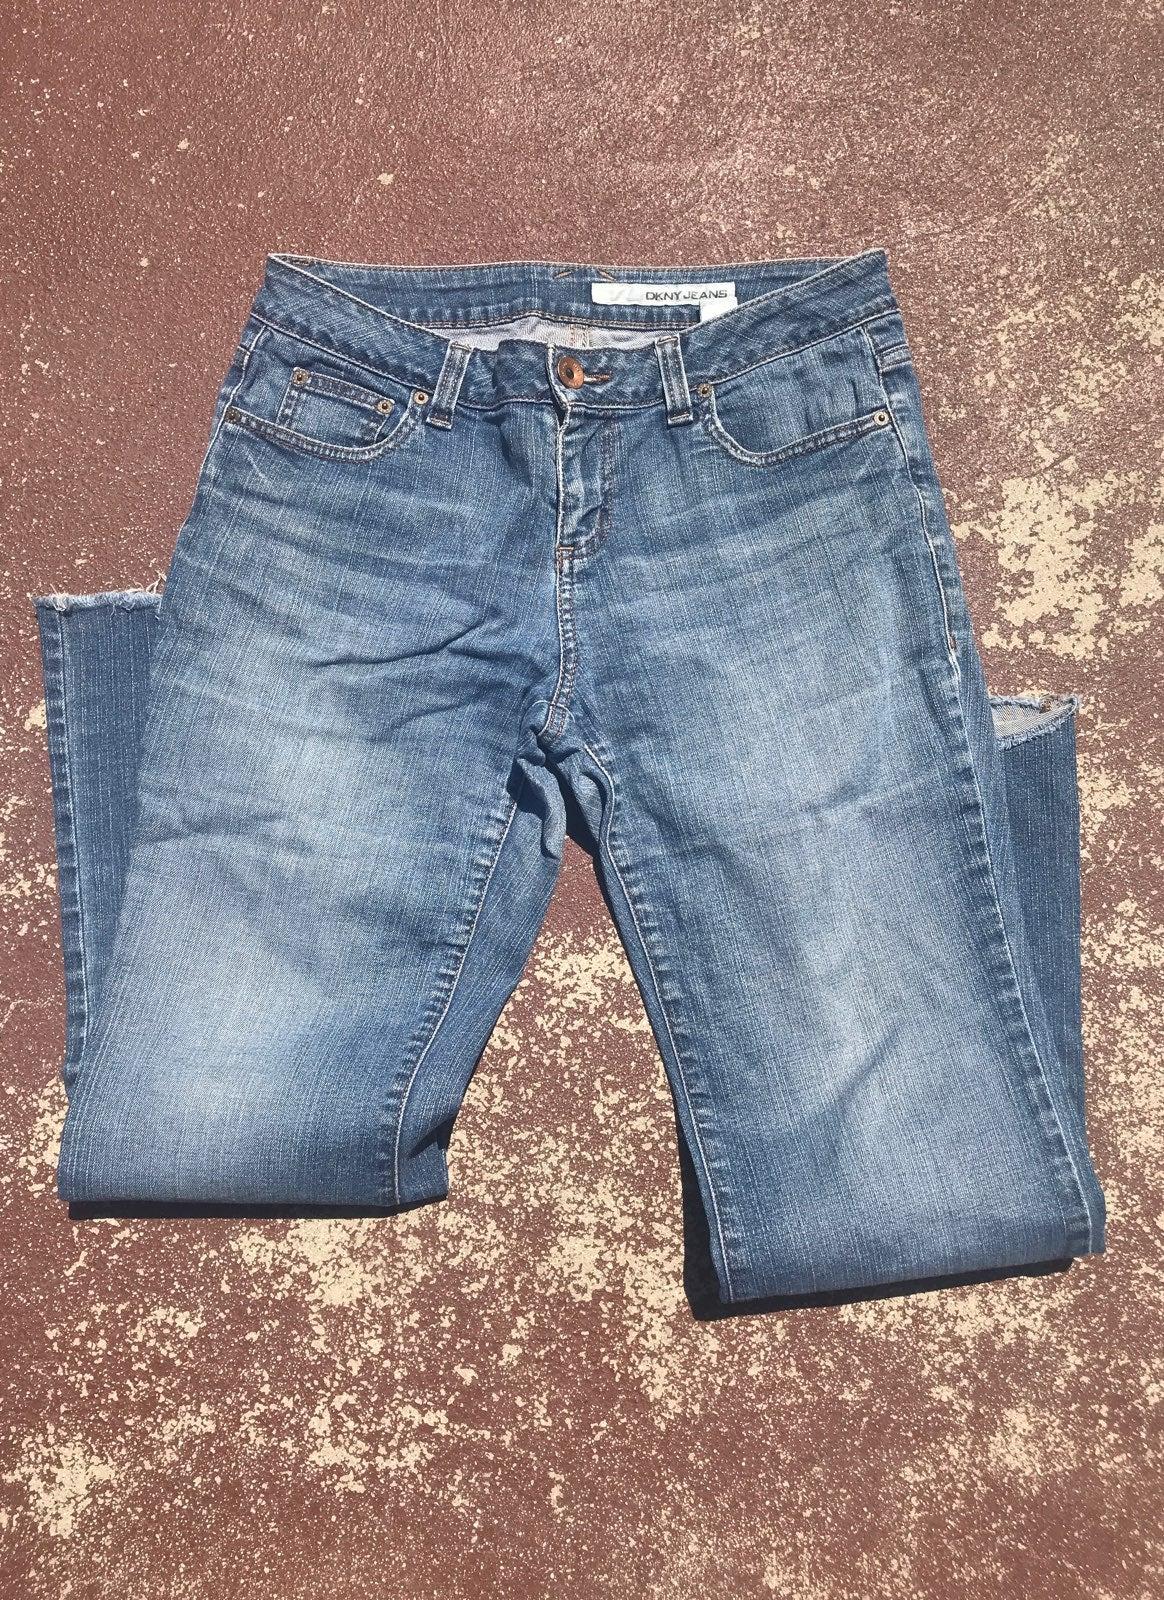 DKNY Women's Denim Jeans 10 R/ R